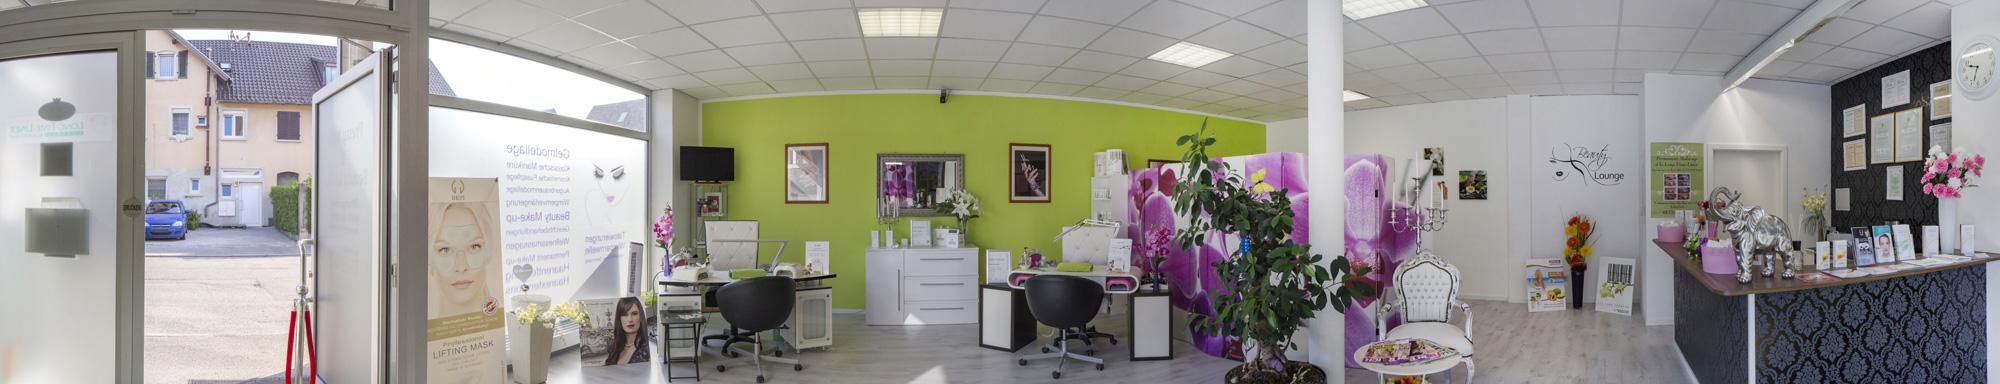 Beauty Lounge Gerlingen - Kreissparkasse Gerlingen - 360° Panorama Tour